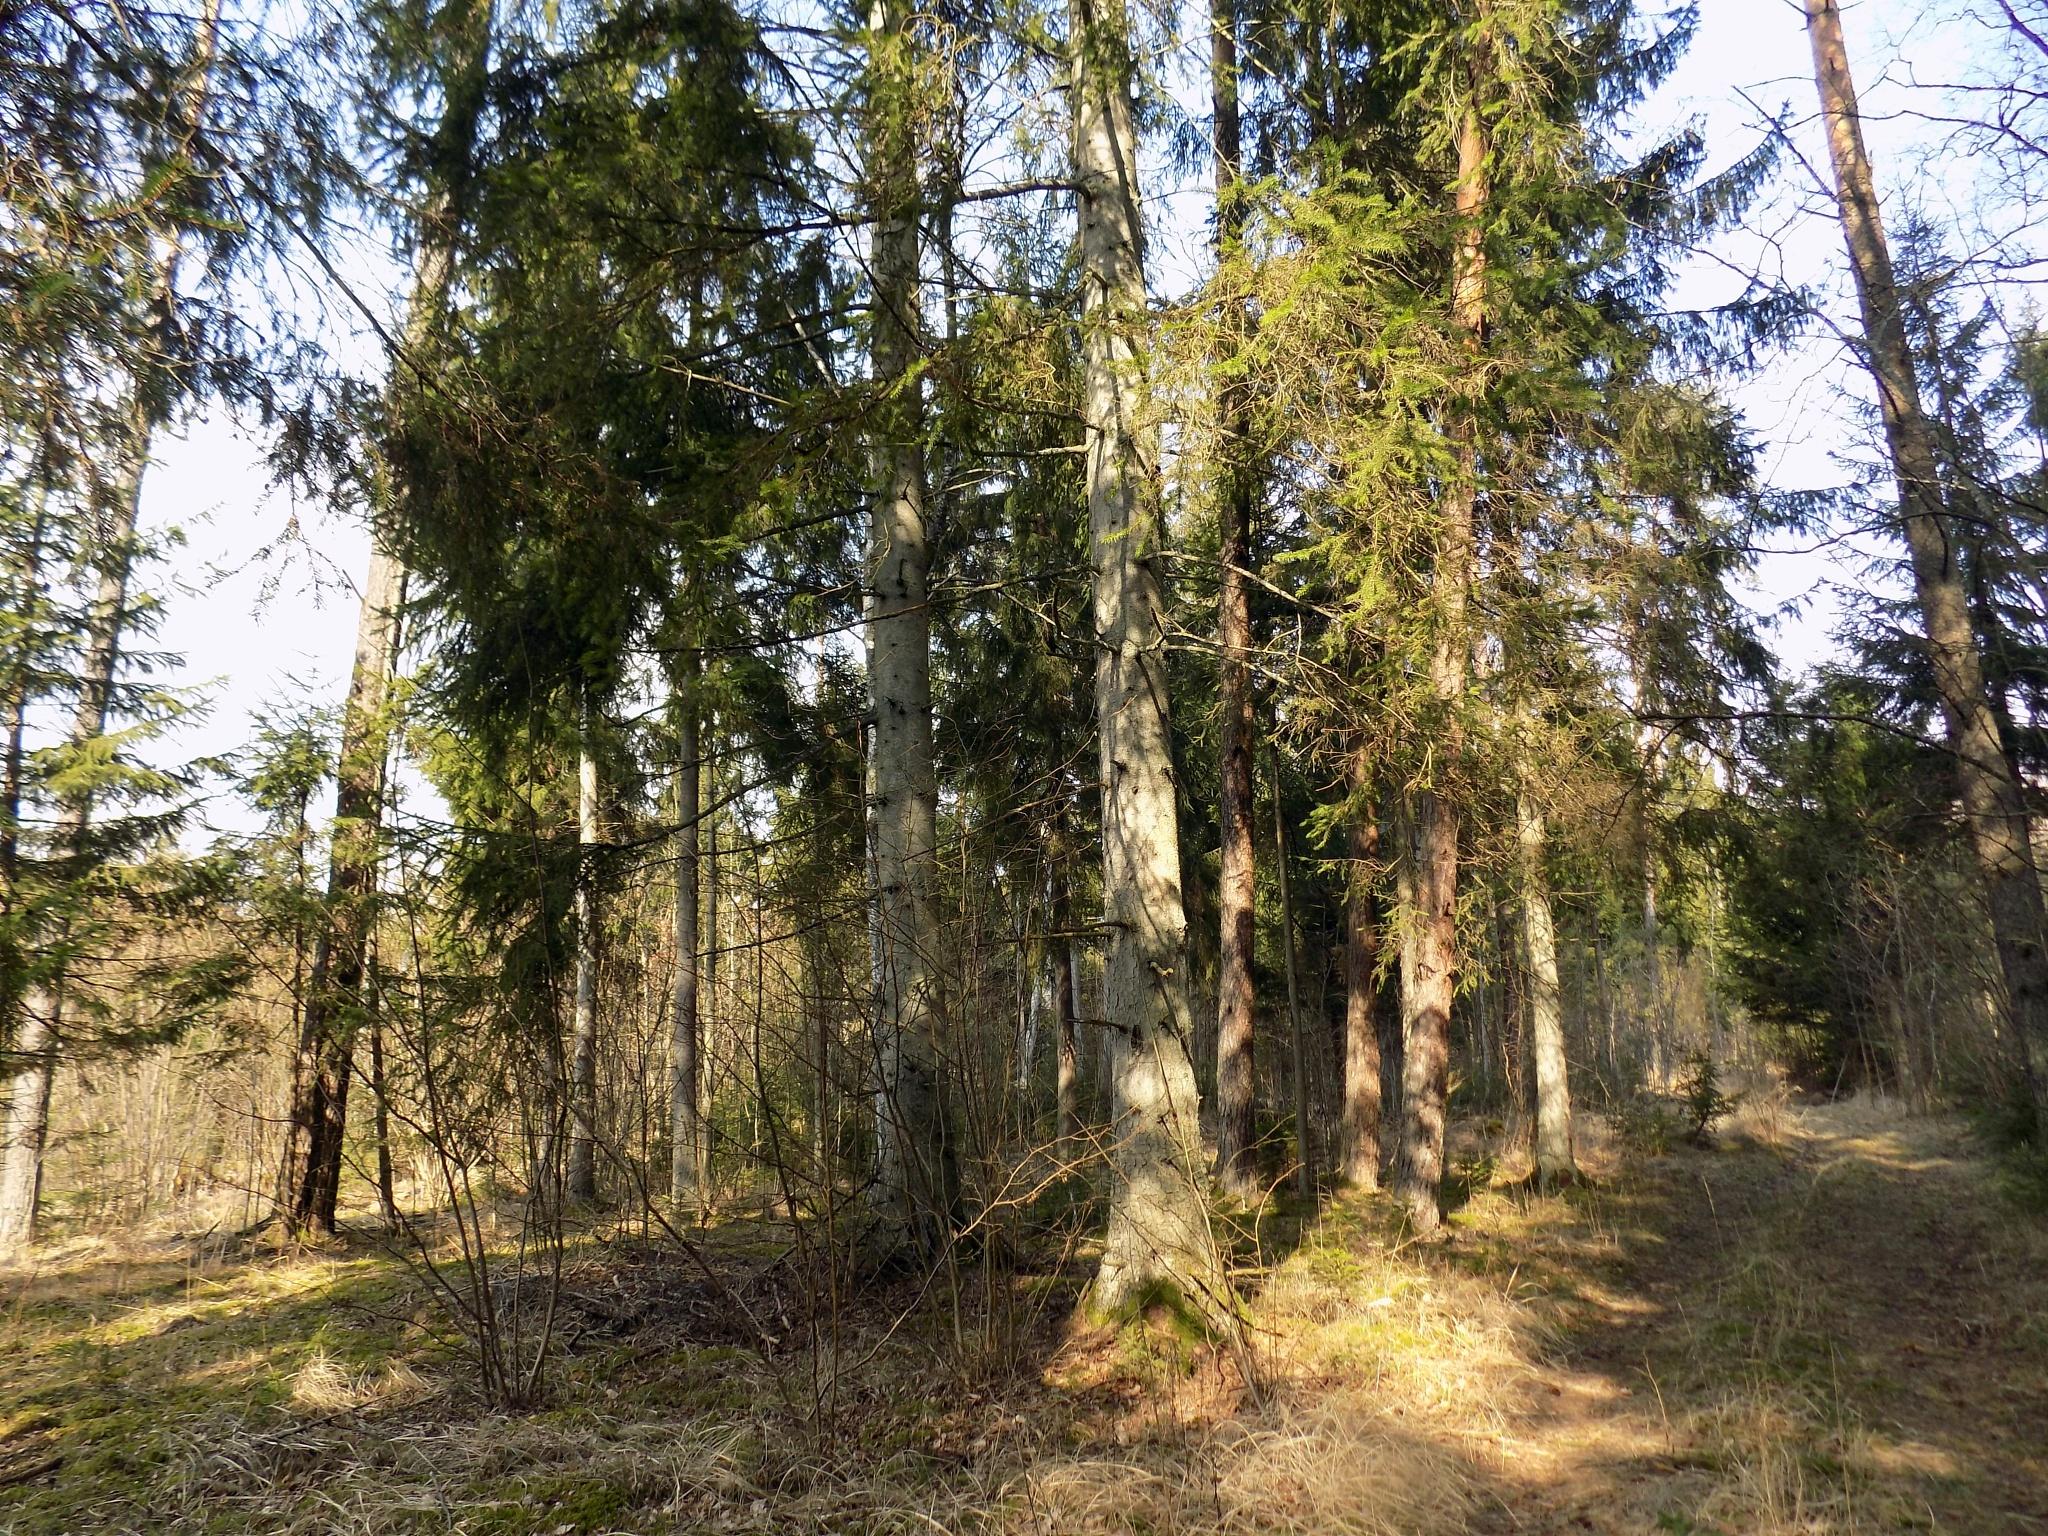 Trees in forest by uzkuraitiene62